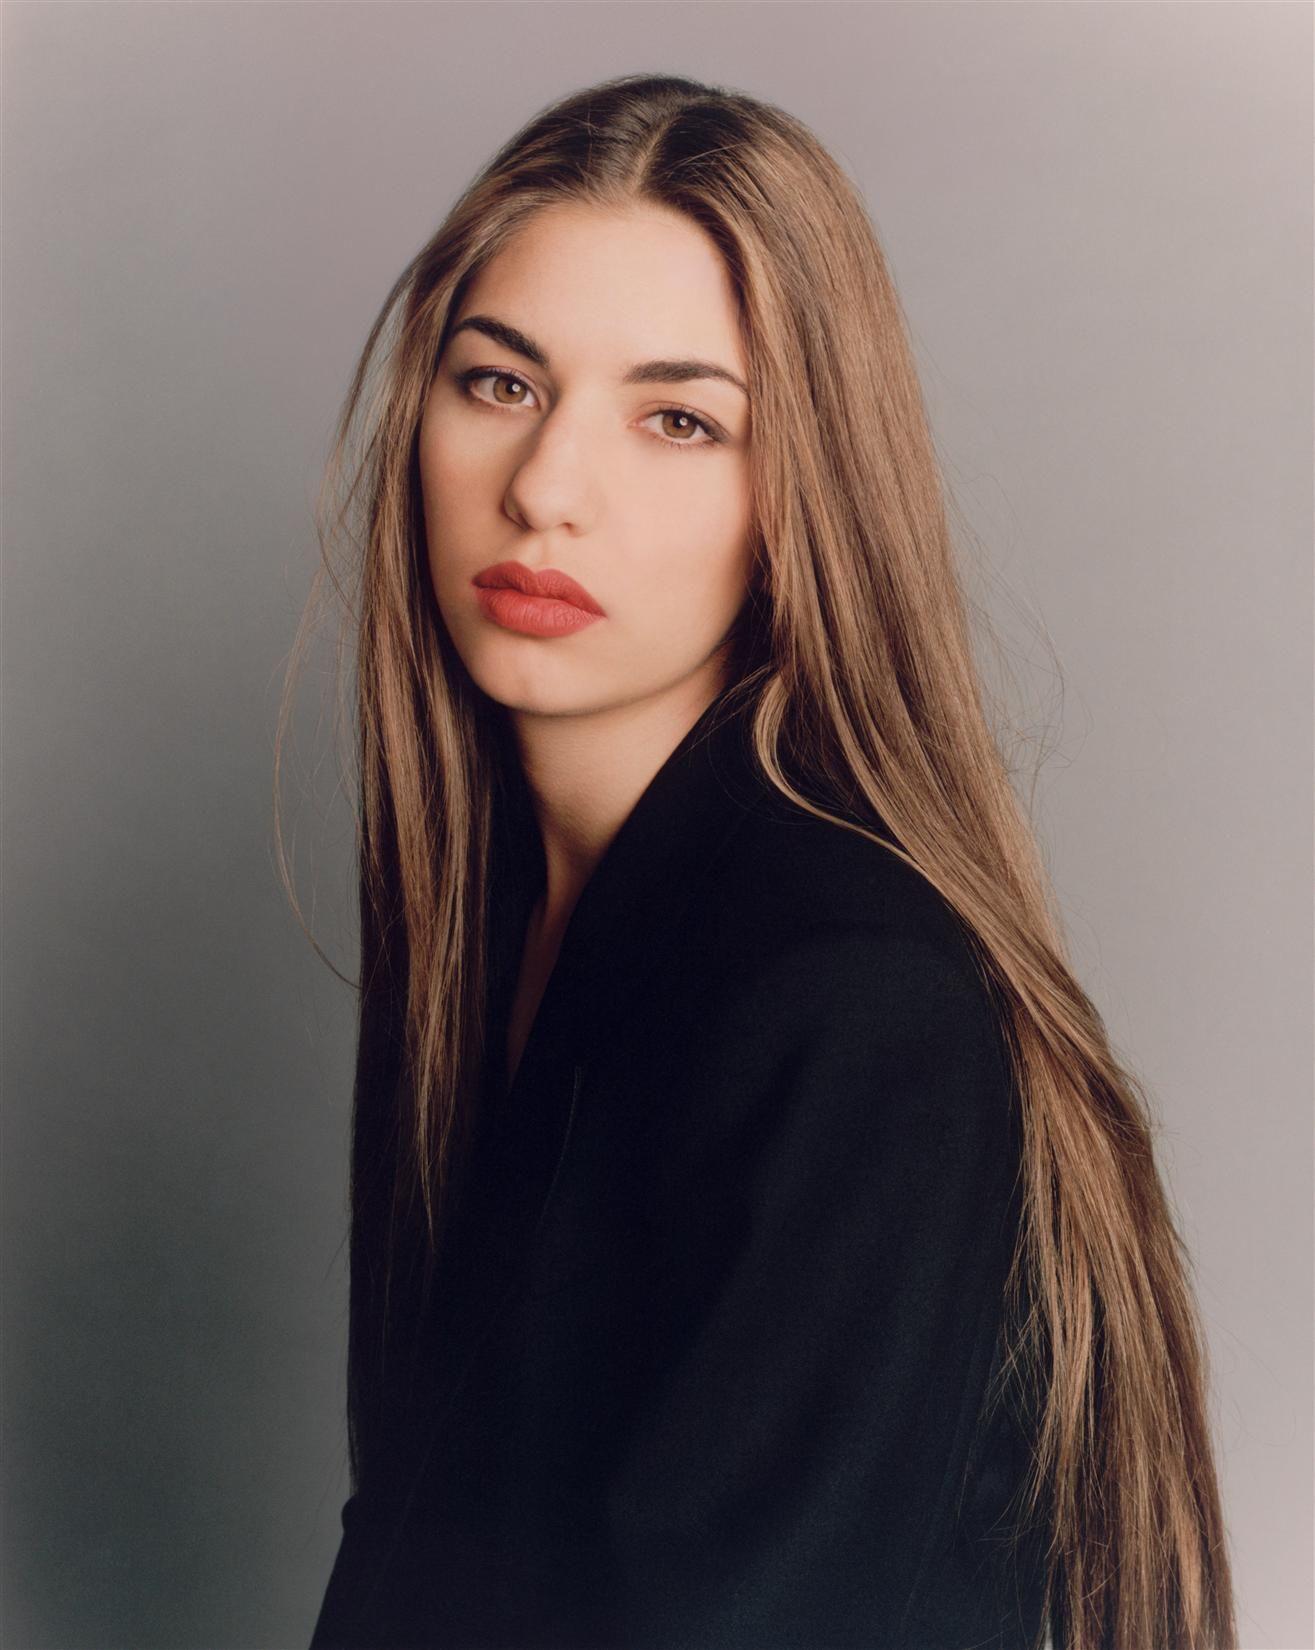 sofia coppola 1990